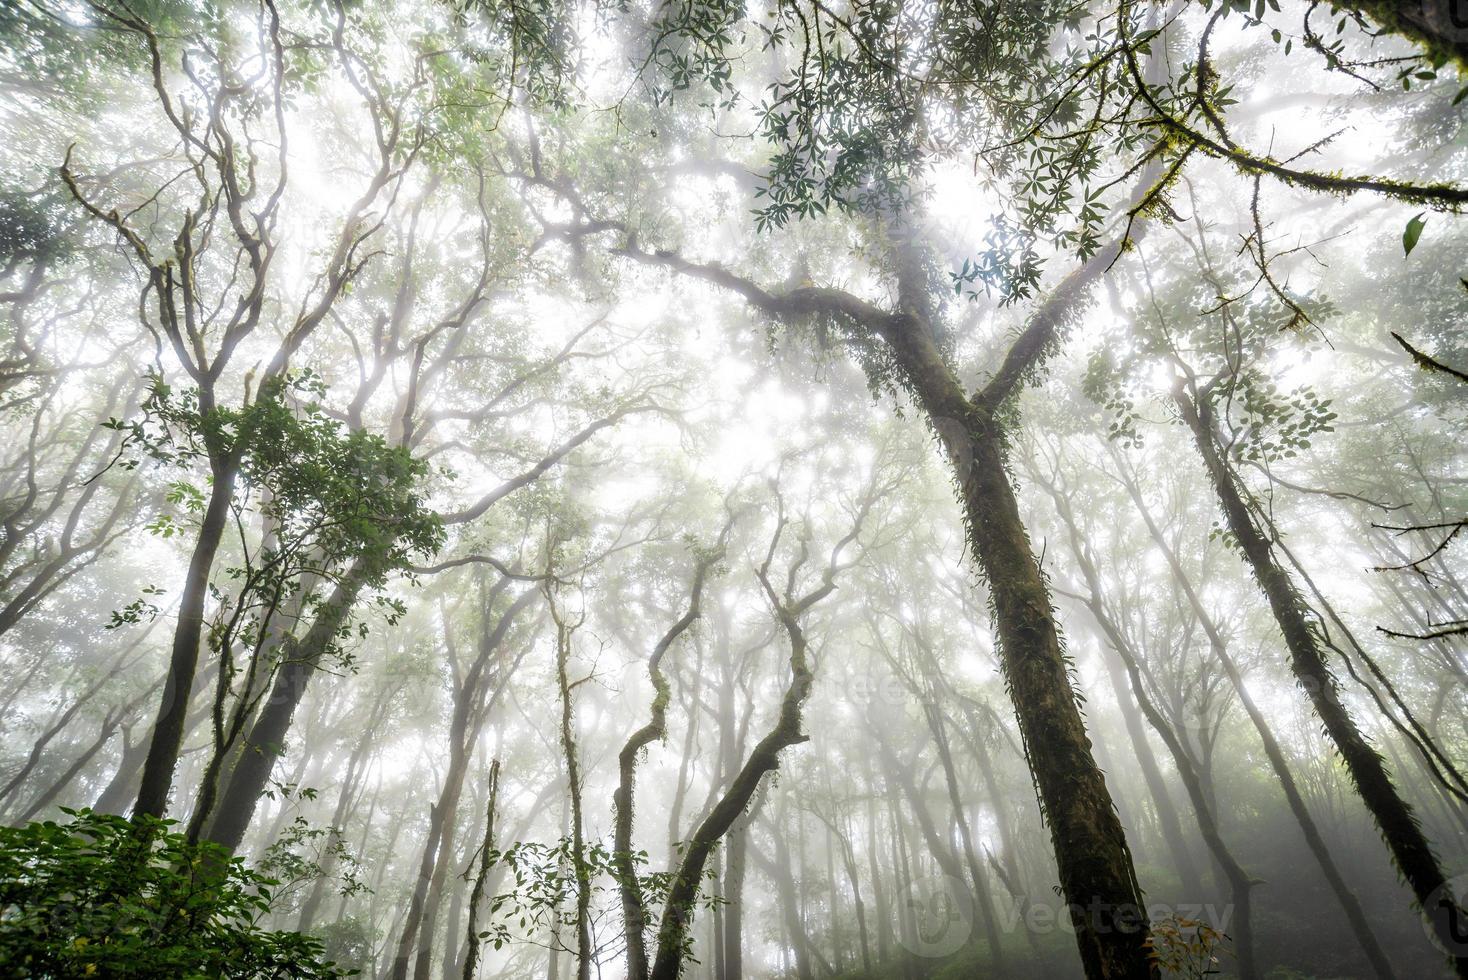 tree forest in autumn season of thailand photo